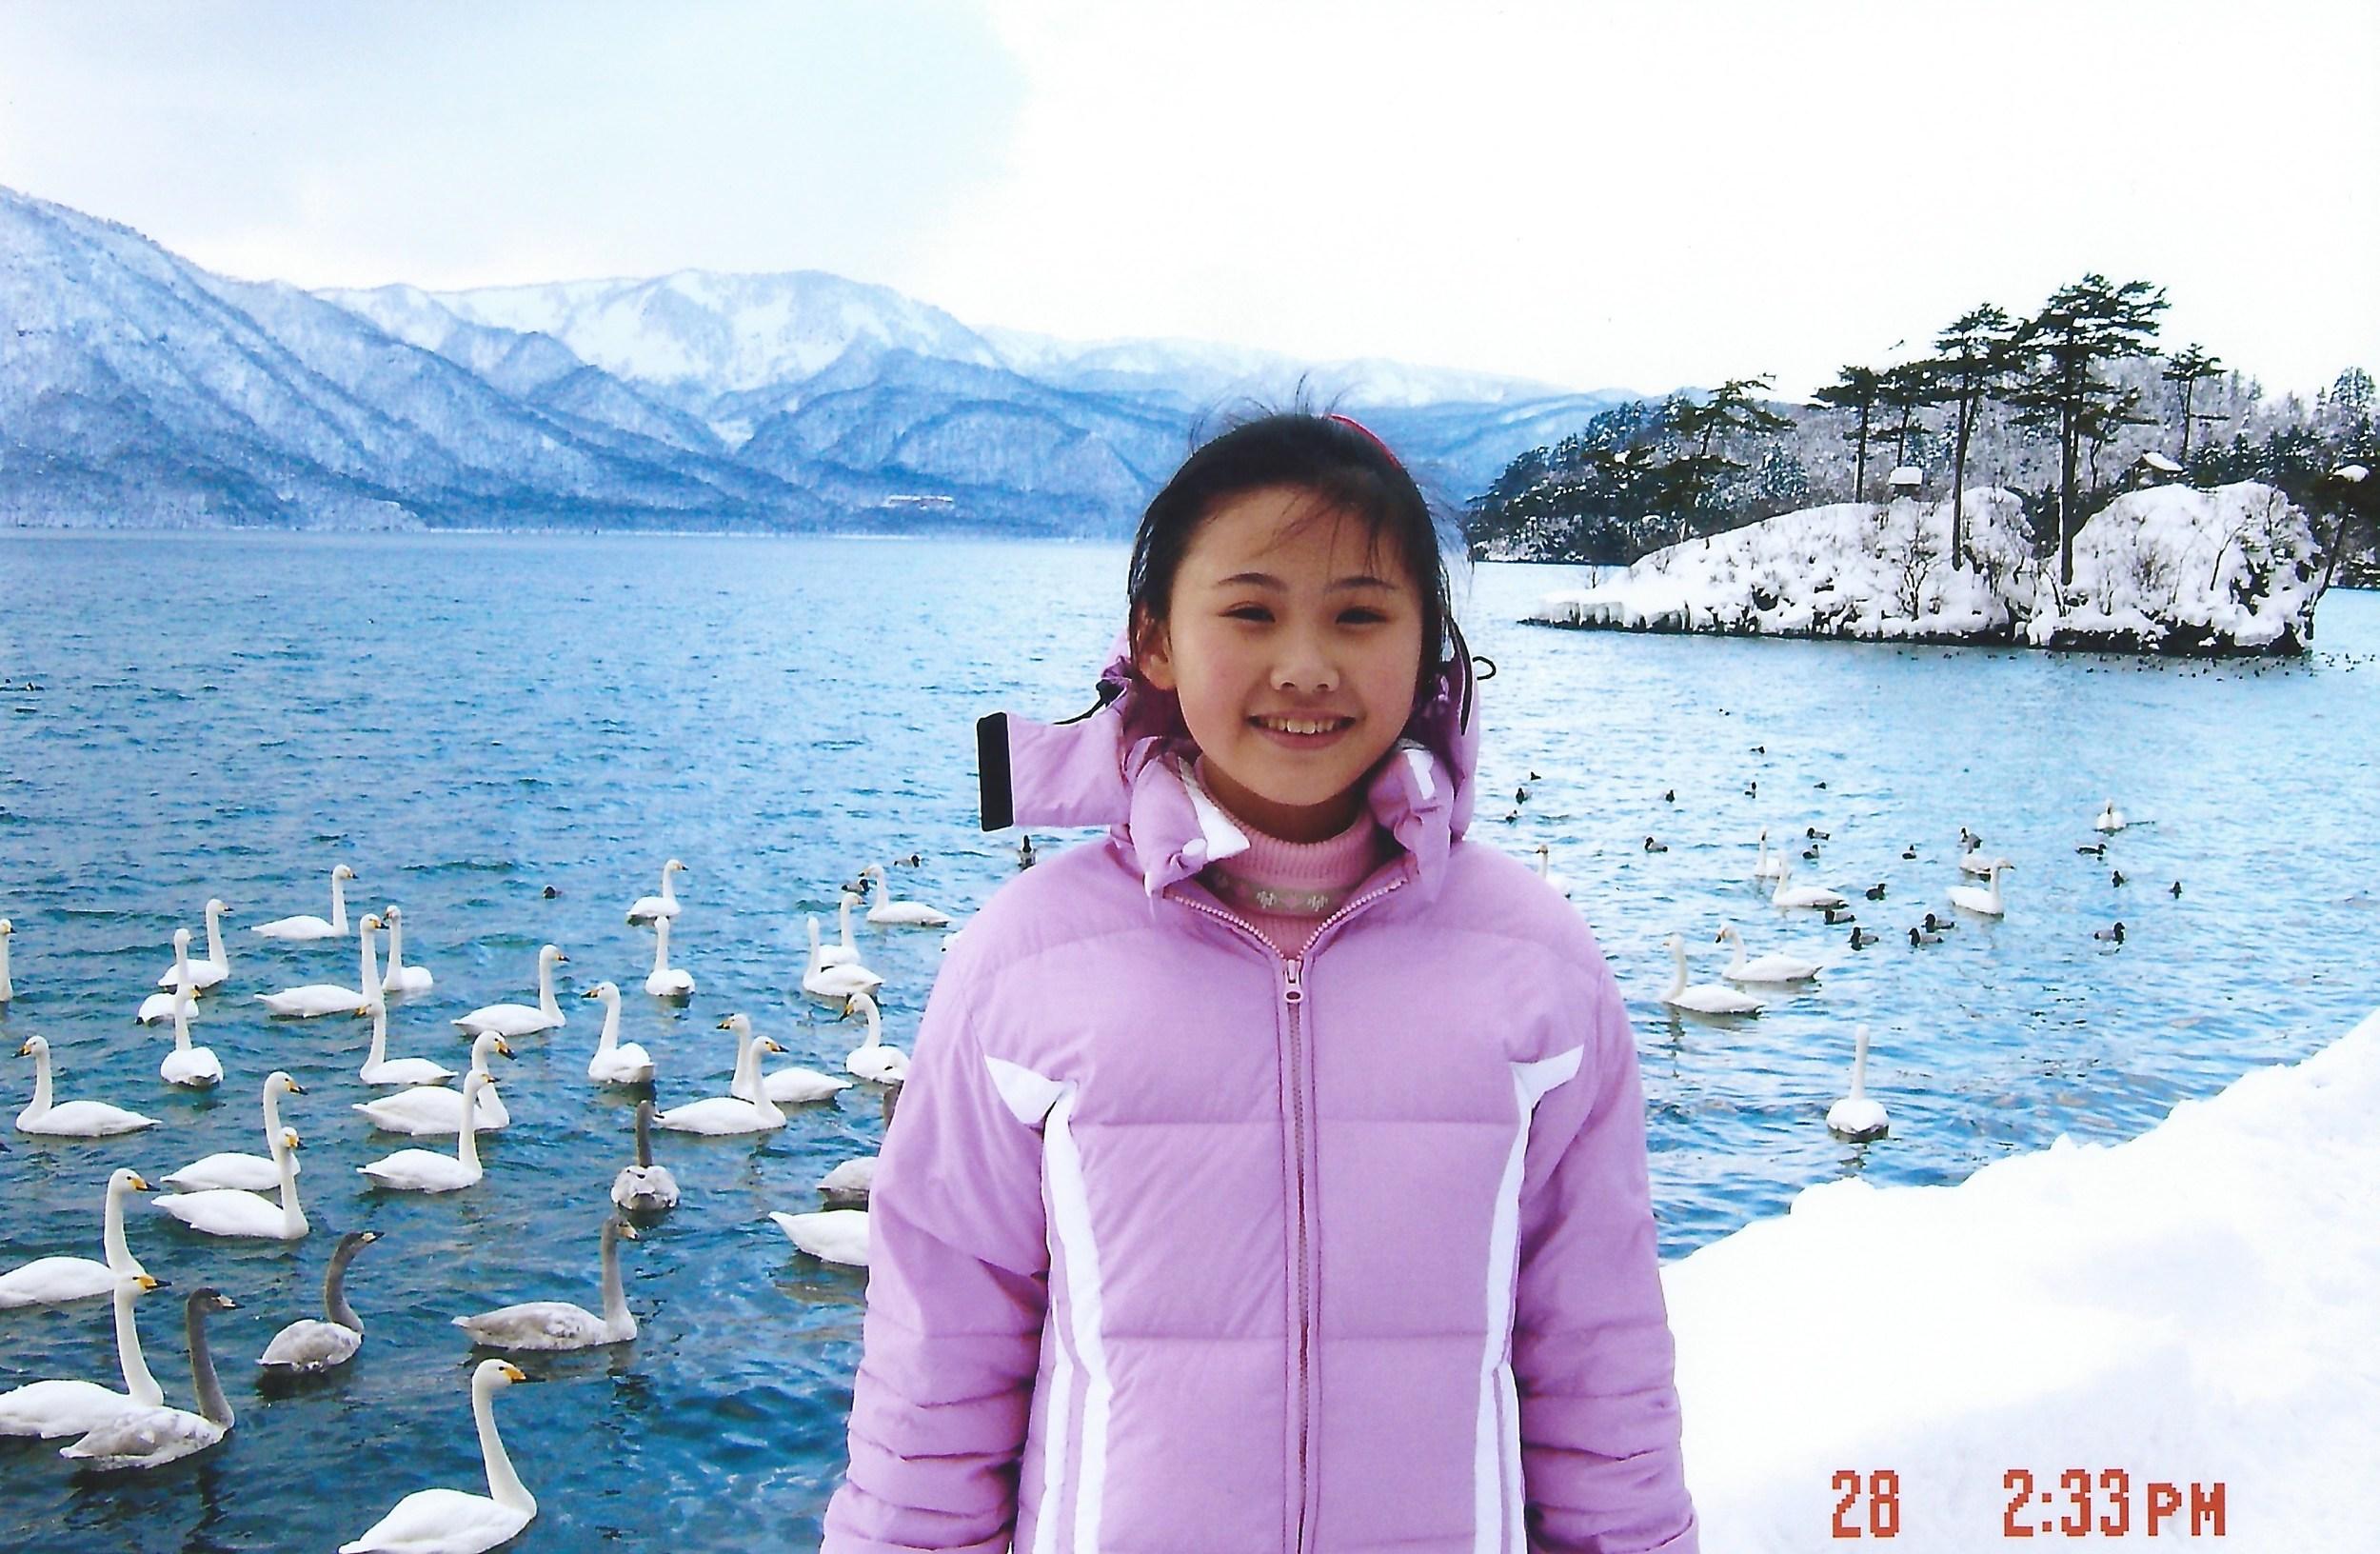 天鵝湖,Hokkaido, Japan